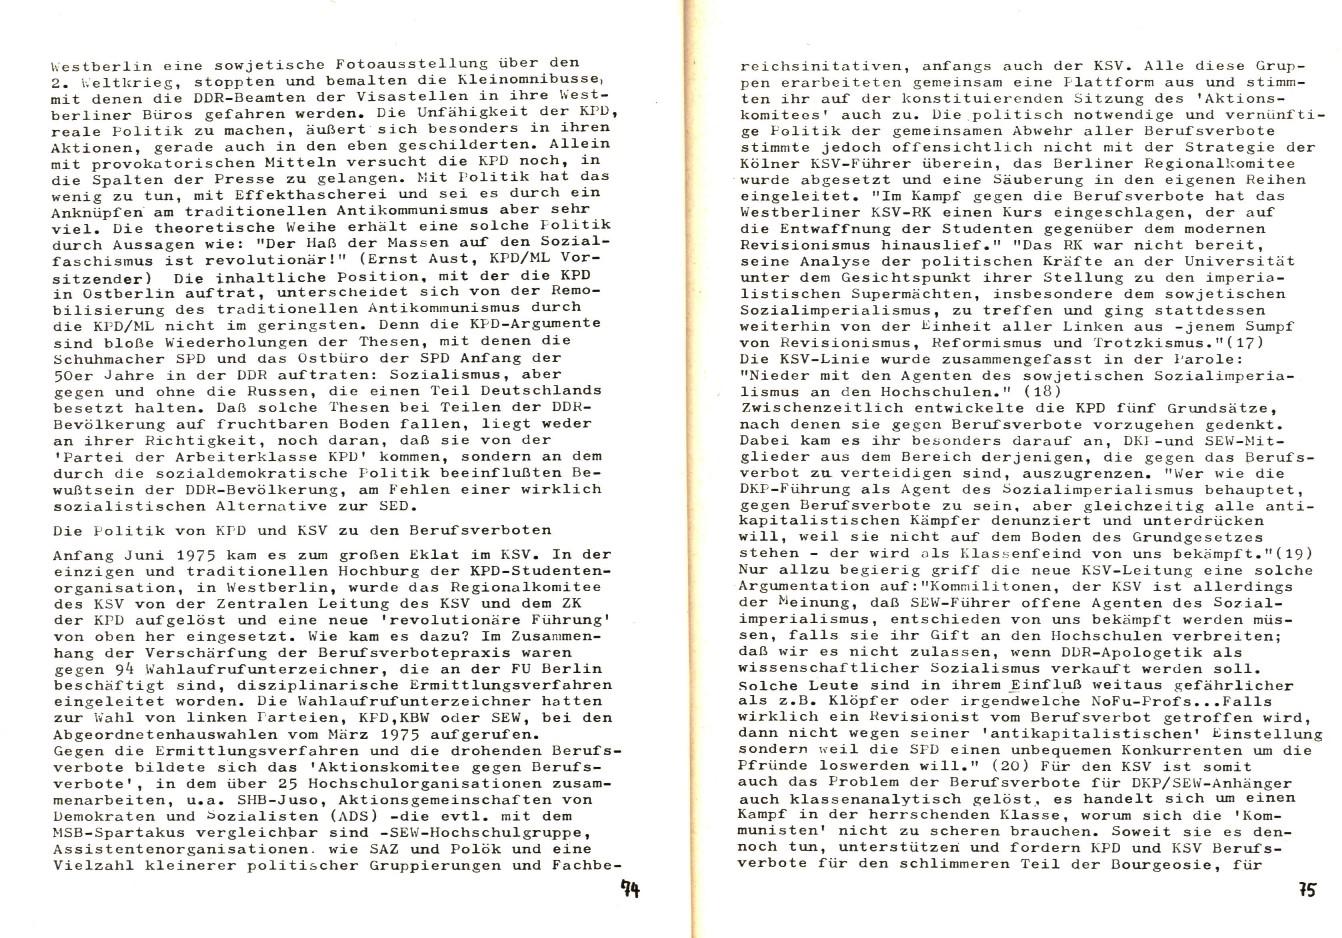 Berlin_KSV_1975_Dokumente_der_SAZ_39